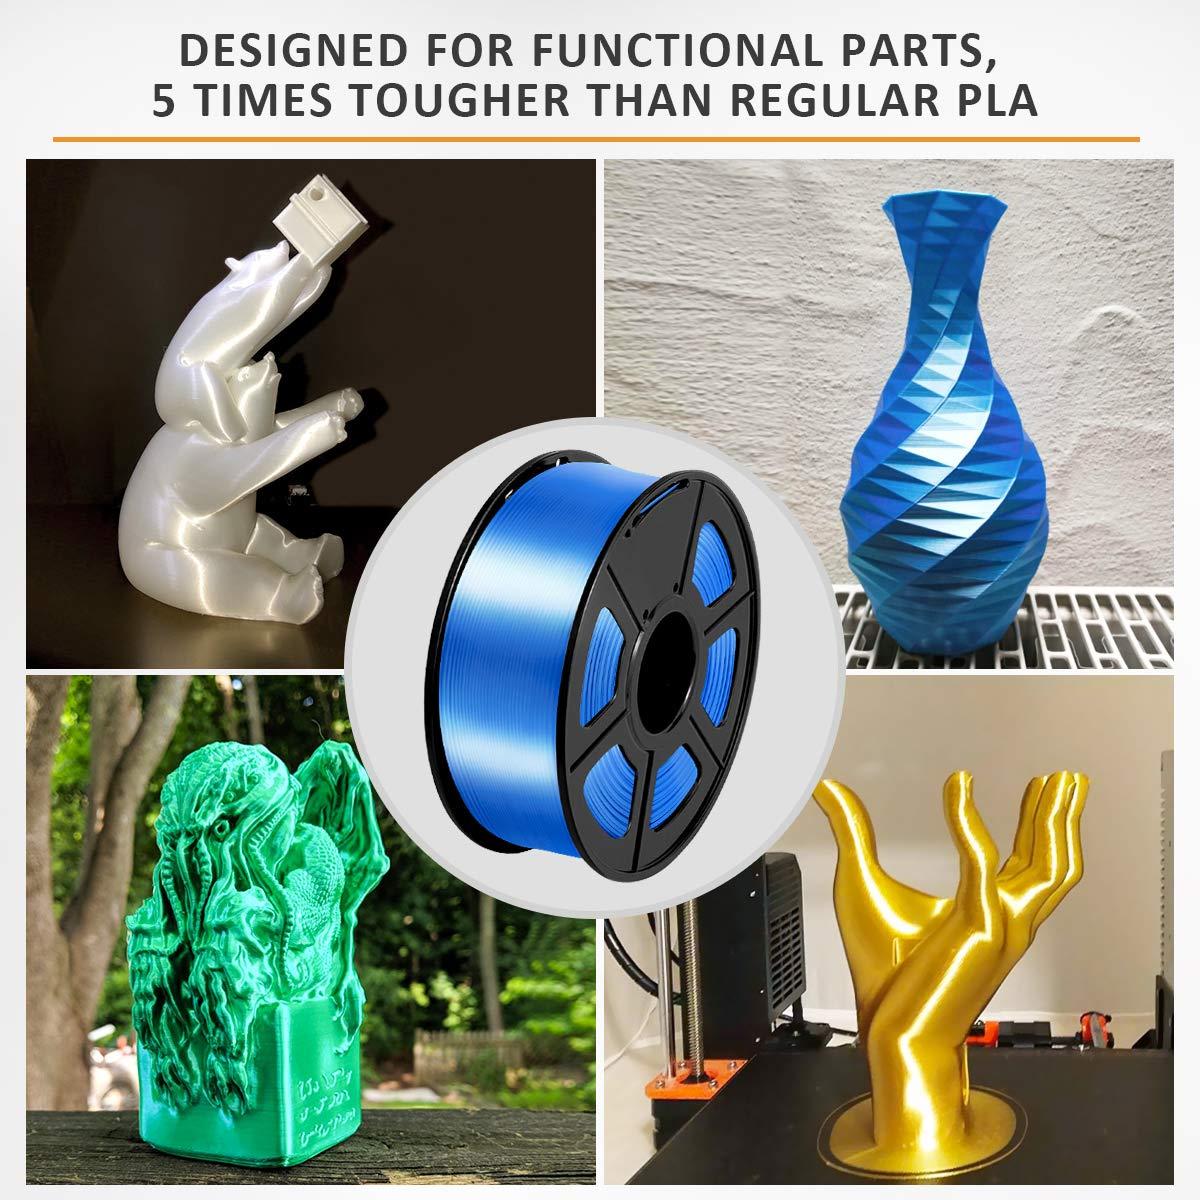 1kg 1 Spool Rouge past/èque SUNLU Silky Shiny Filament PLA 1.75mm 3D Printing Filament PLA for 3D Printer and 3D Pen 1 Rojo sand/ía